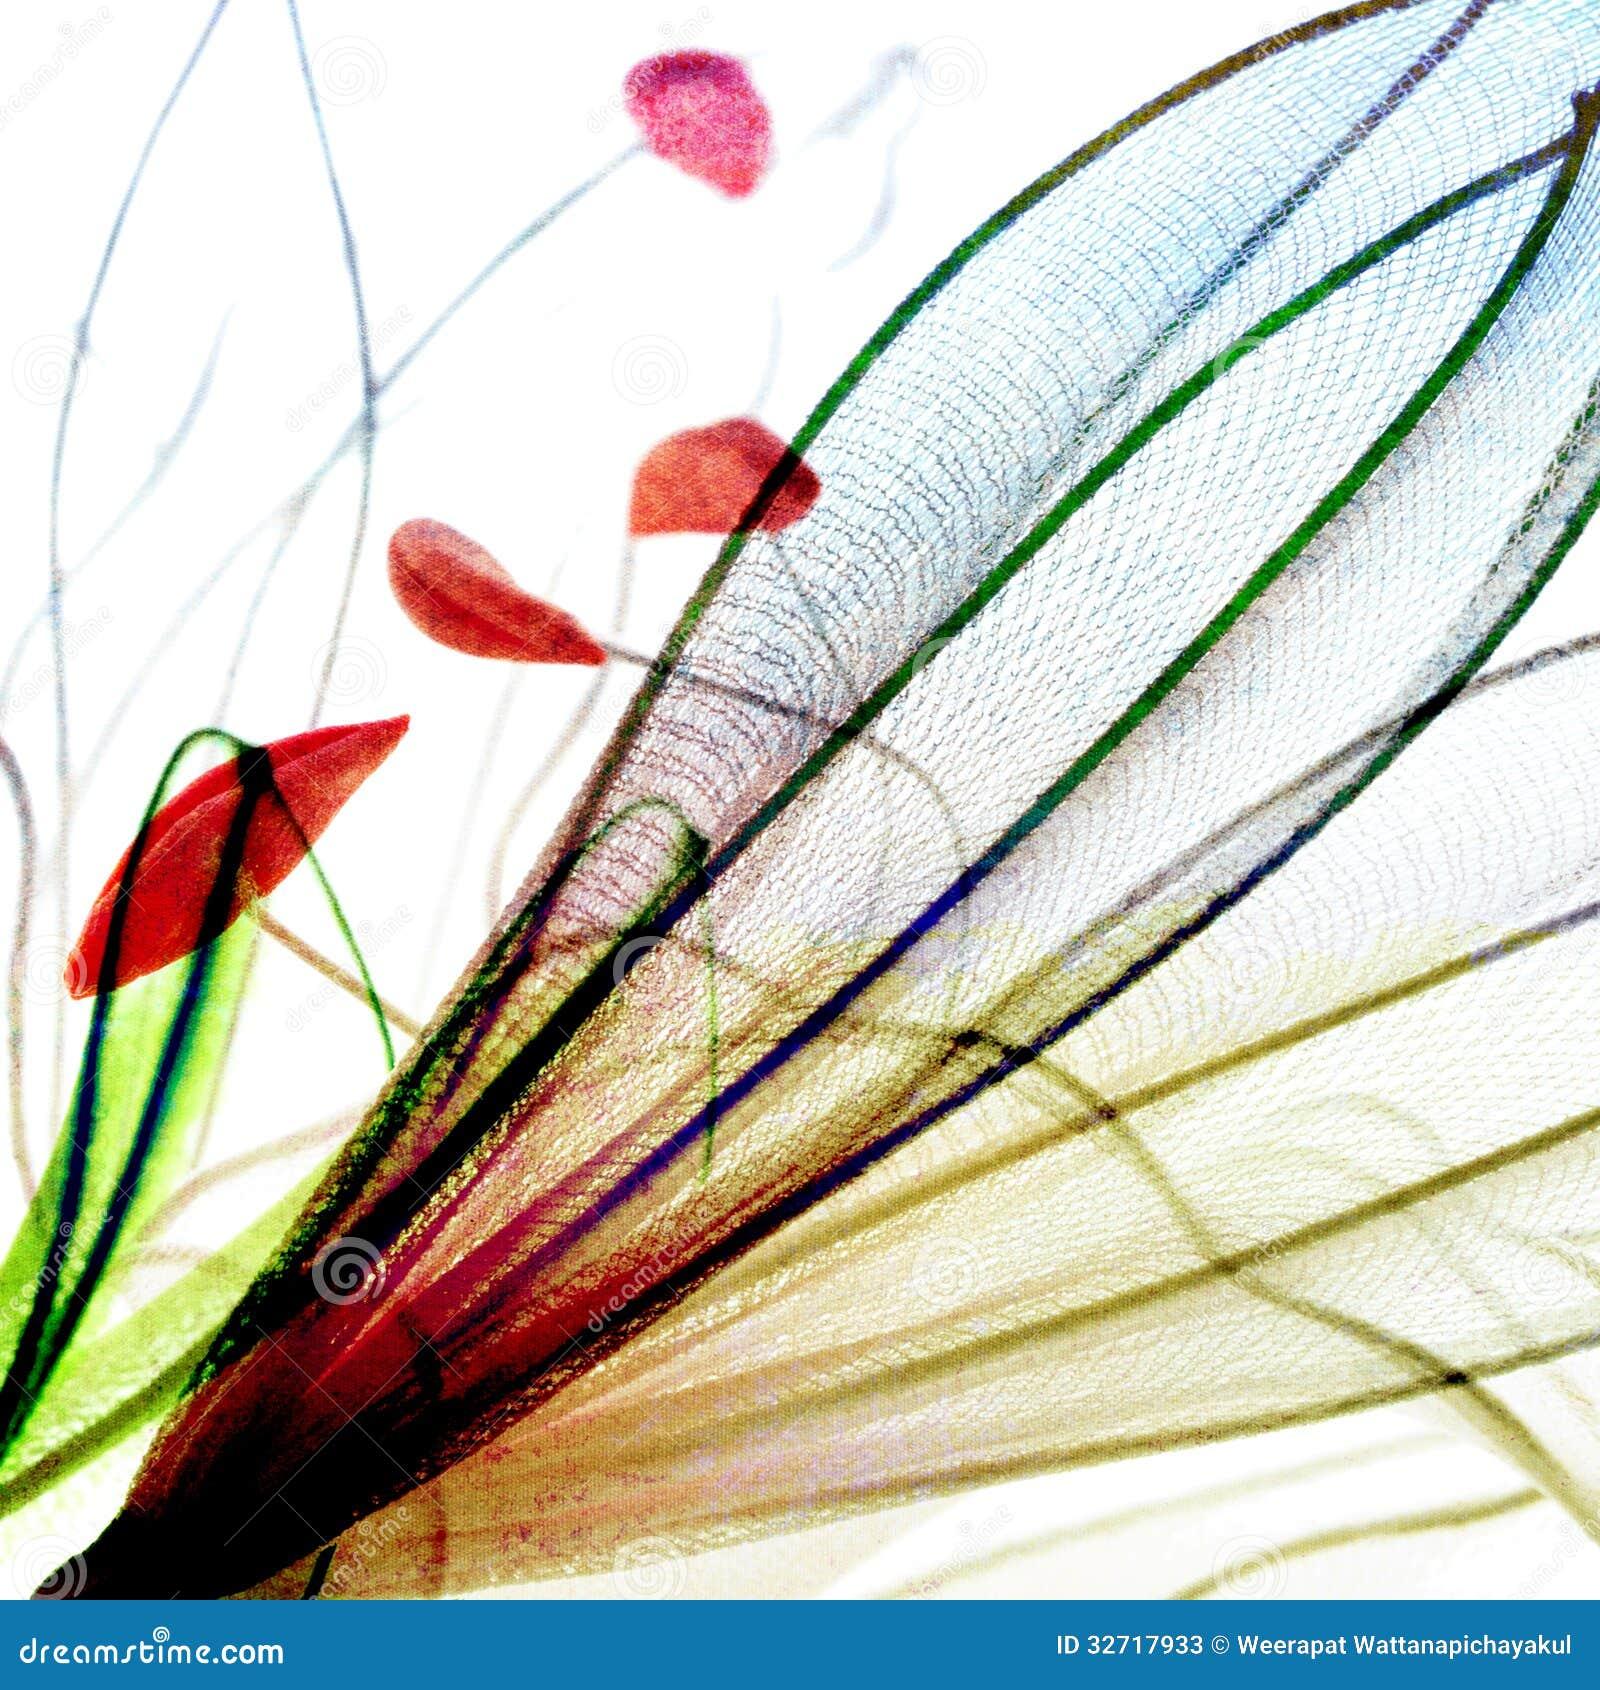 Petal and pollen design